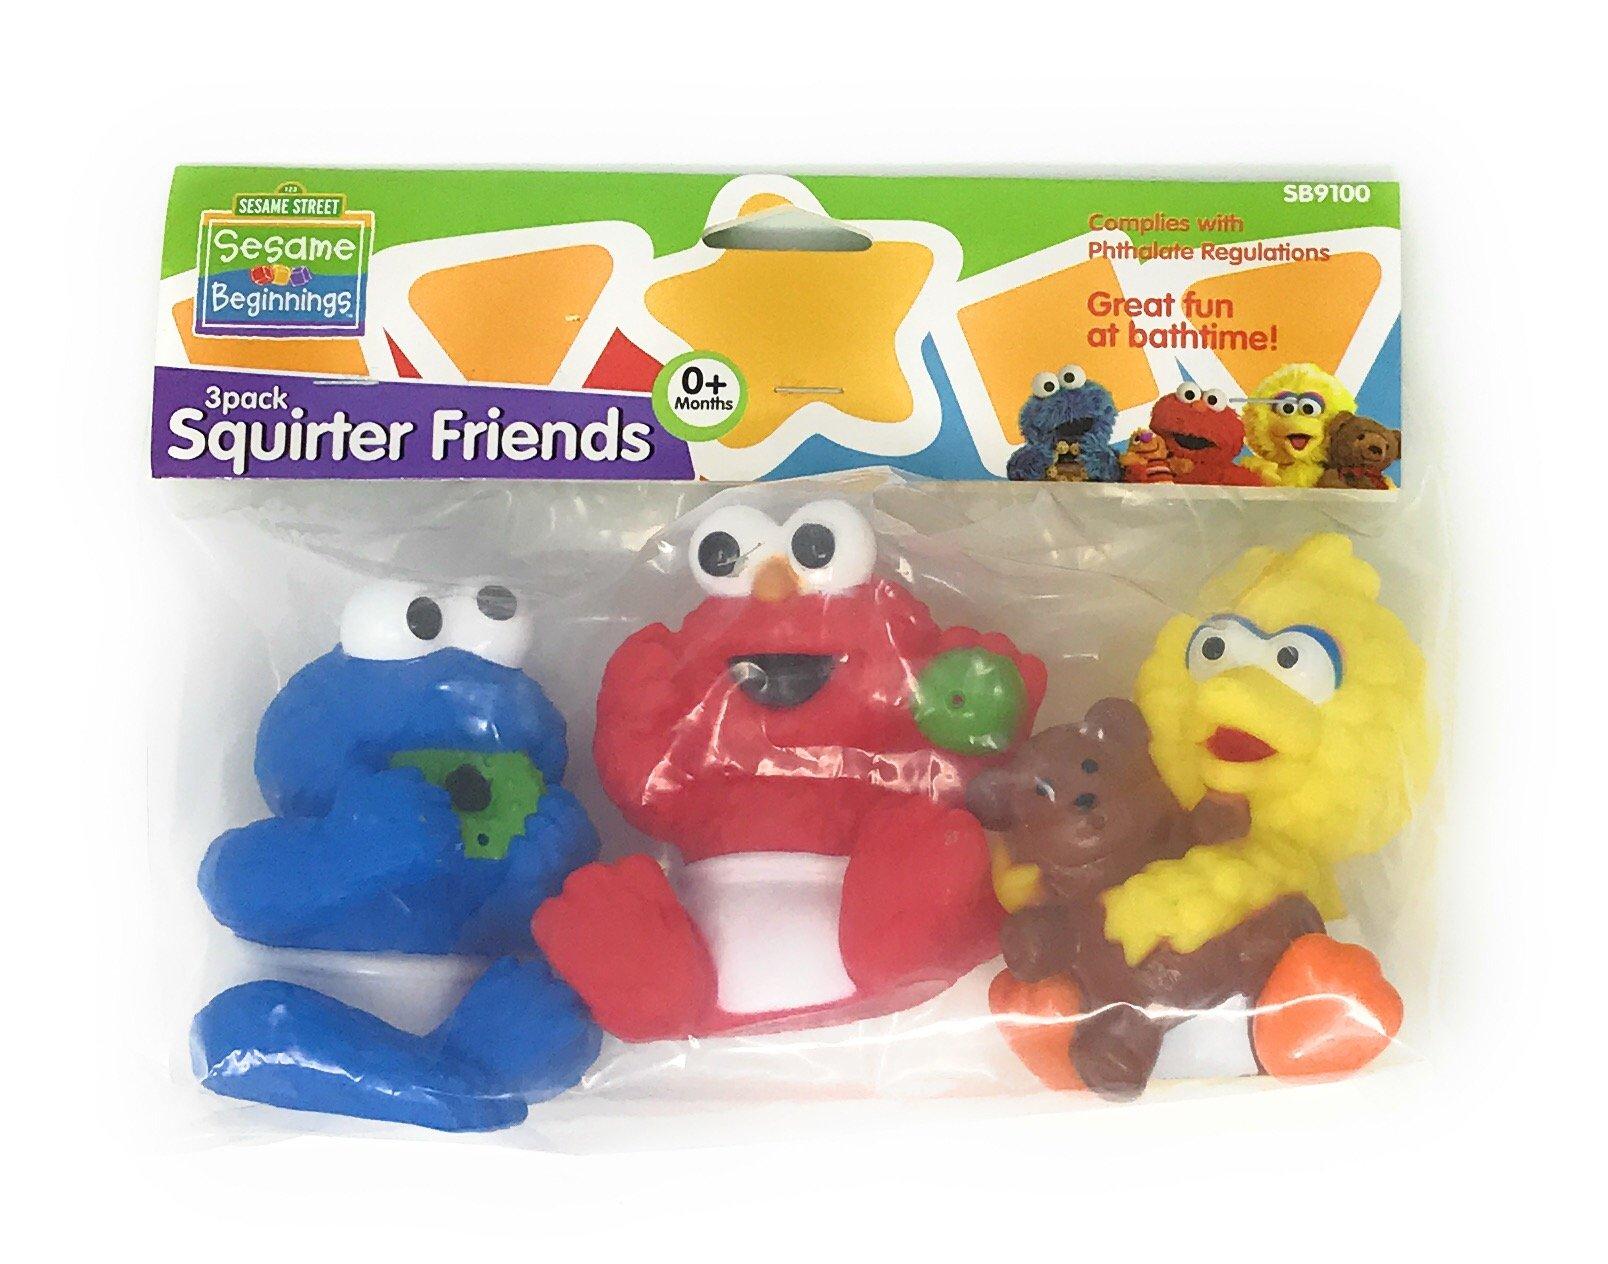 Sesame Street Friends Bath Tub Squirter 3-Pack with Cookie Monster, Elmo & Big Bird by Sesame Street